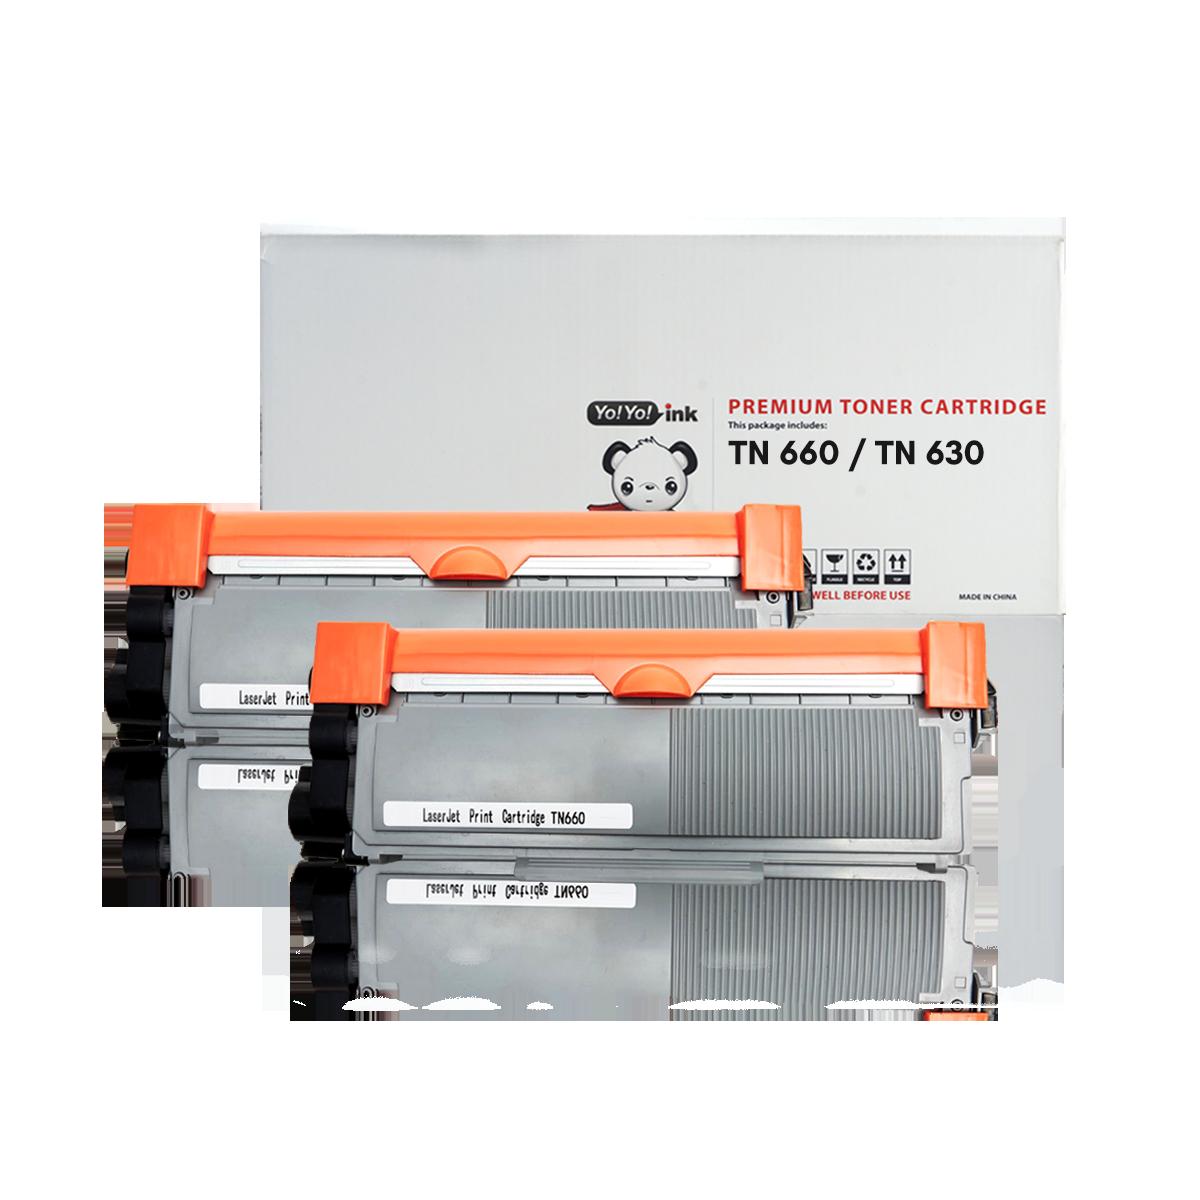 Brother TN660 Printer Toner Cartridges